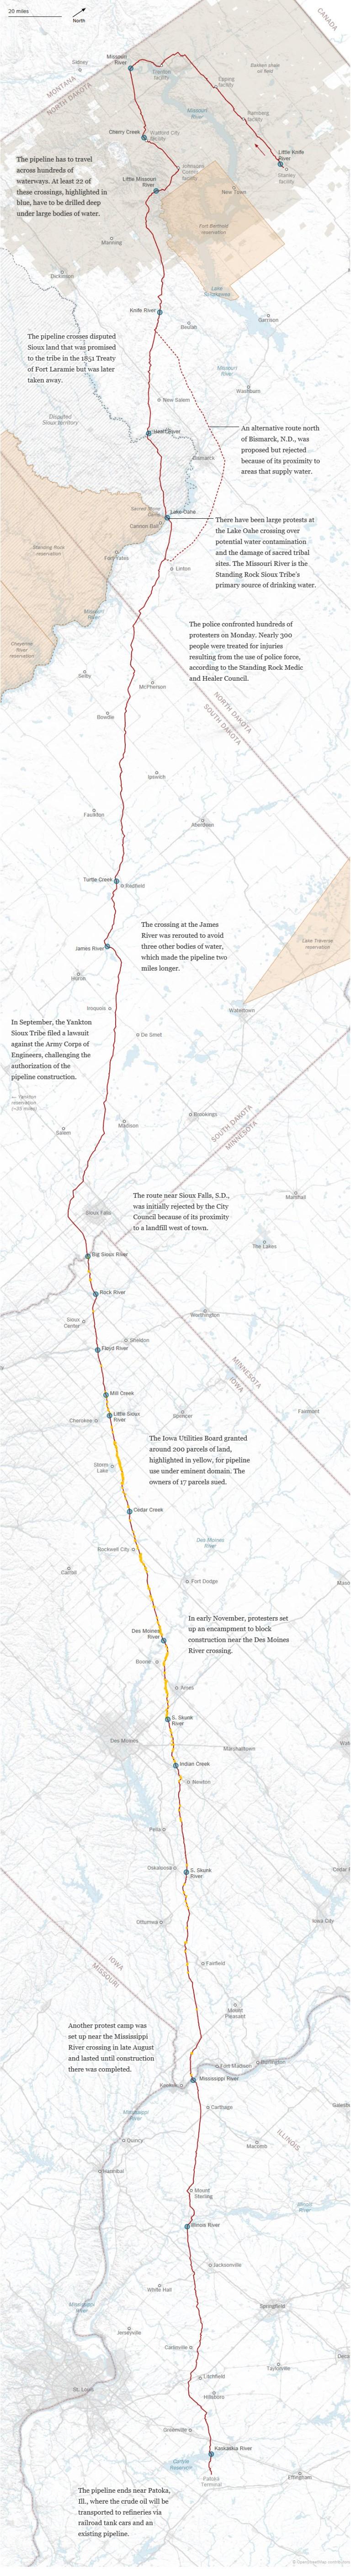 dakota-access-pipeline-long-vertical-map